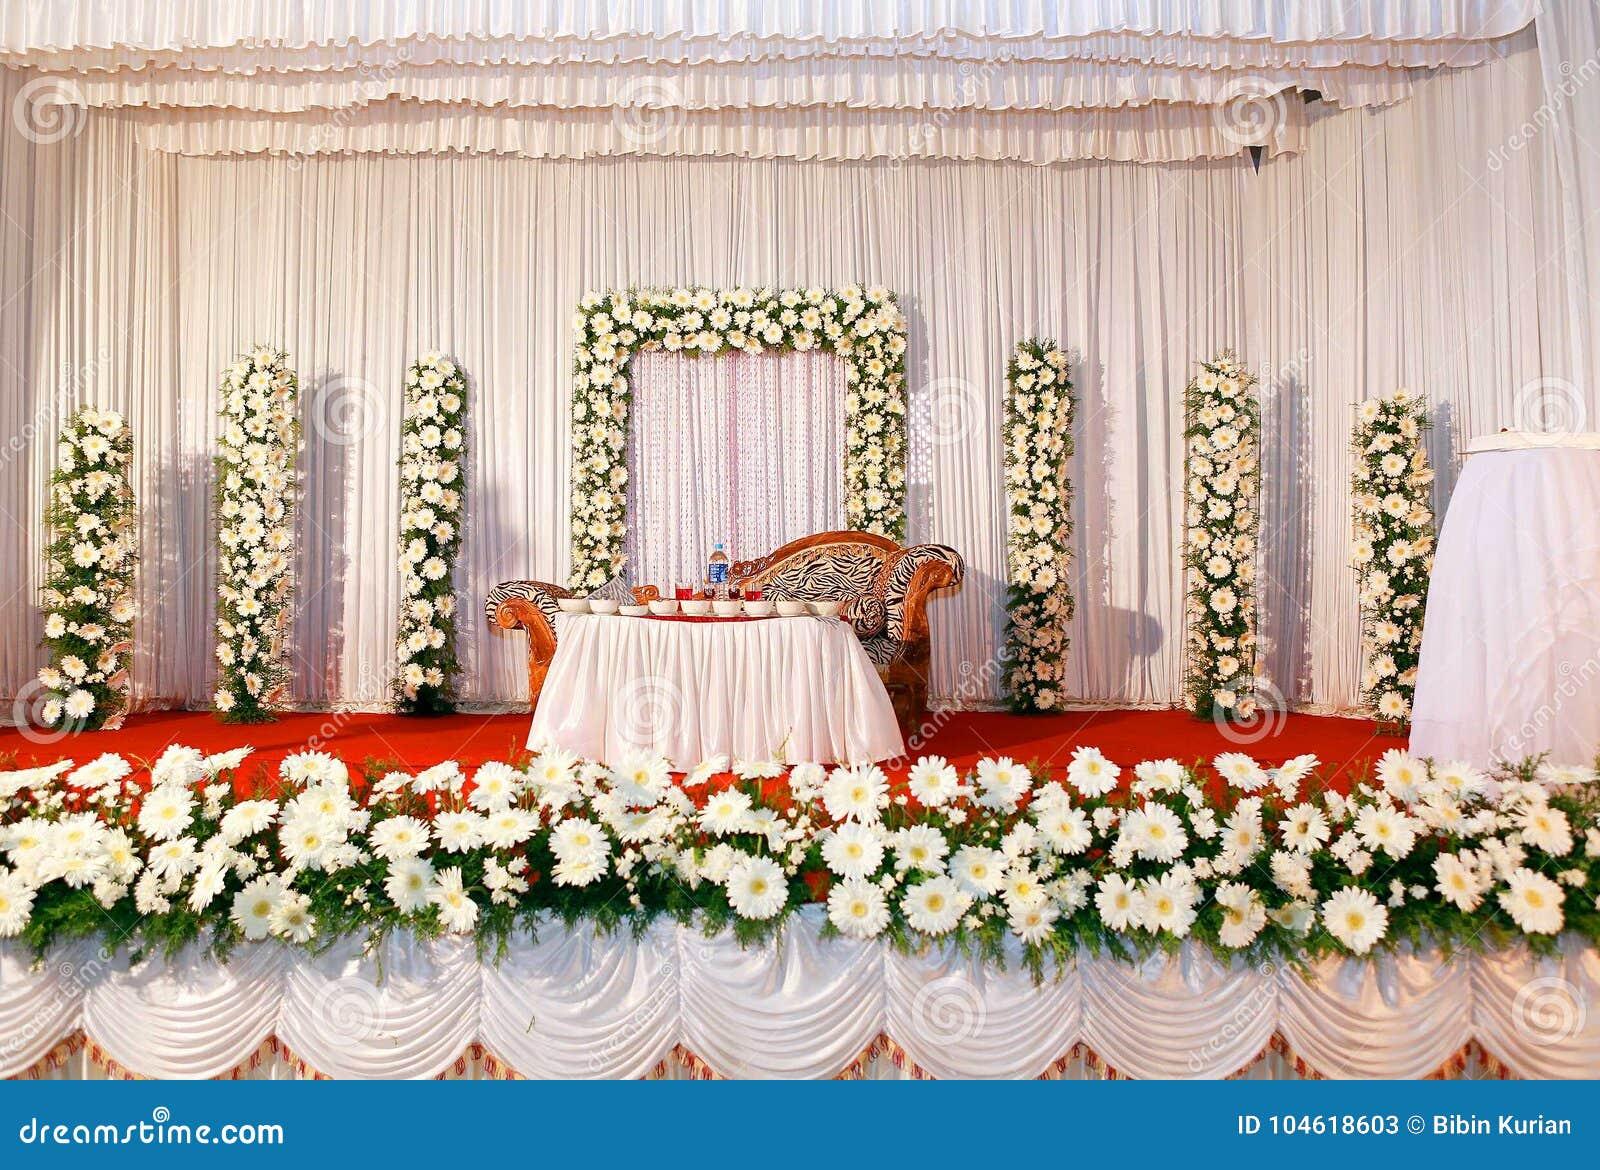 Wedding Stock Image Image Of Stage Decoration Ceremony 104618603